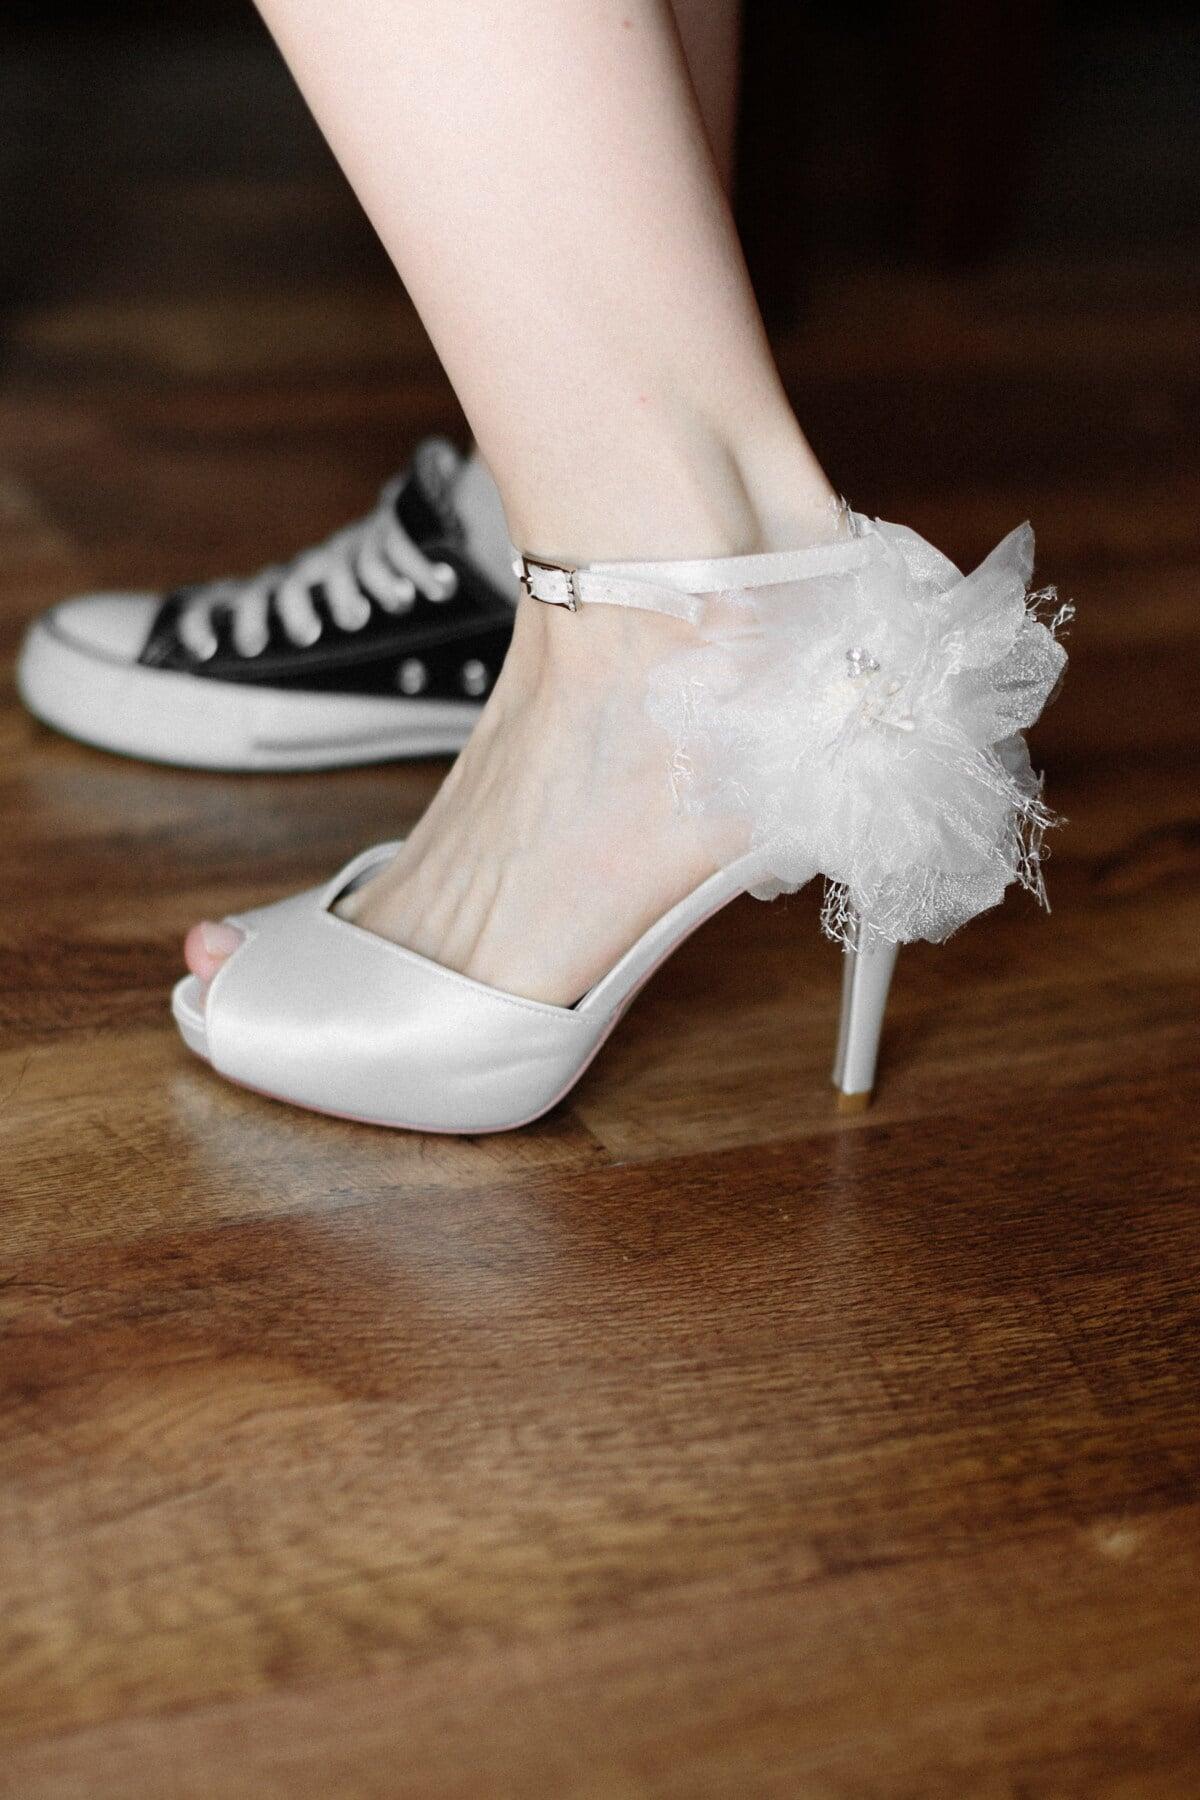 heels, sandal, white, elegant, wedding, classic, leg, sneakers, comfortable, fashion